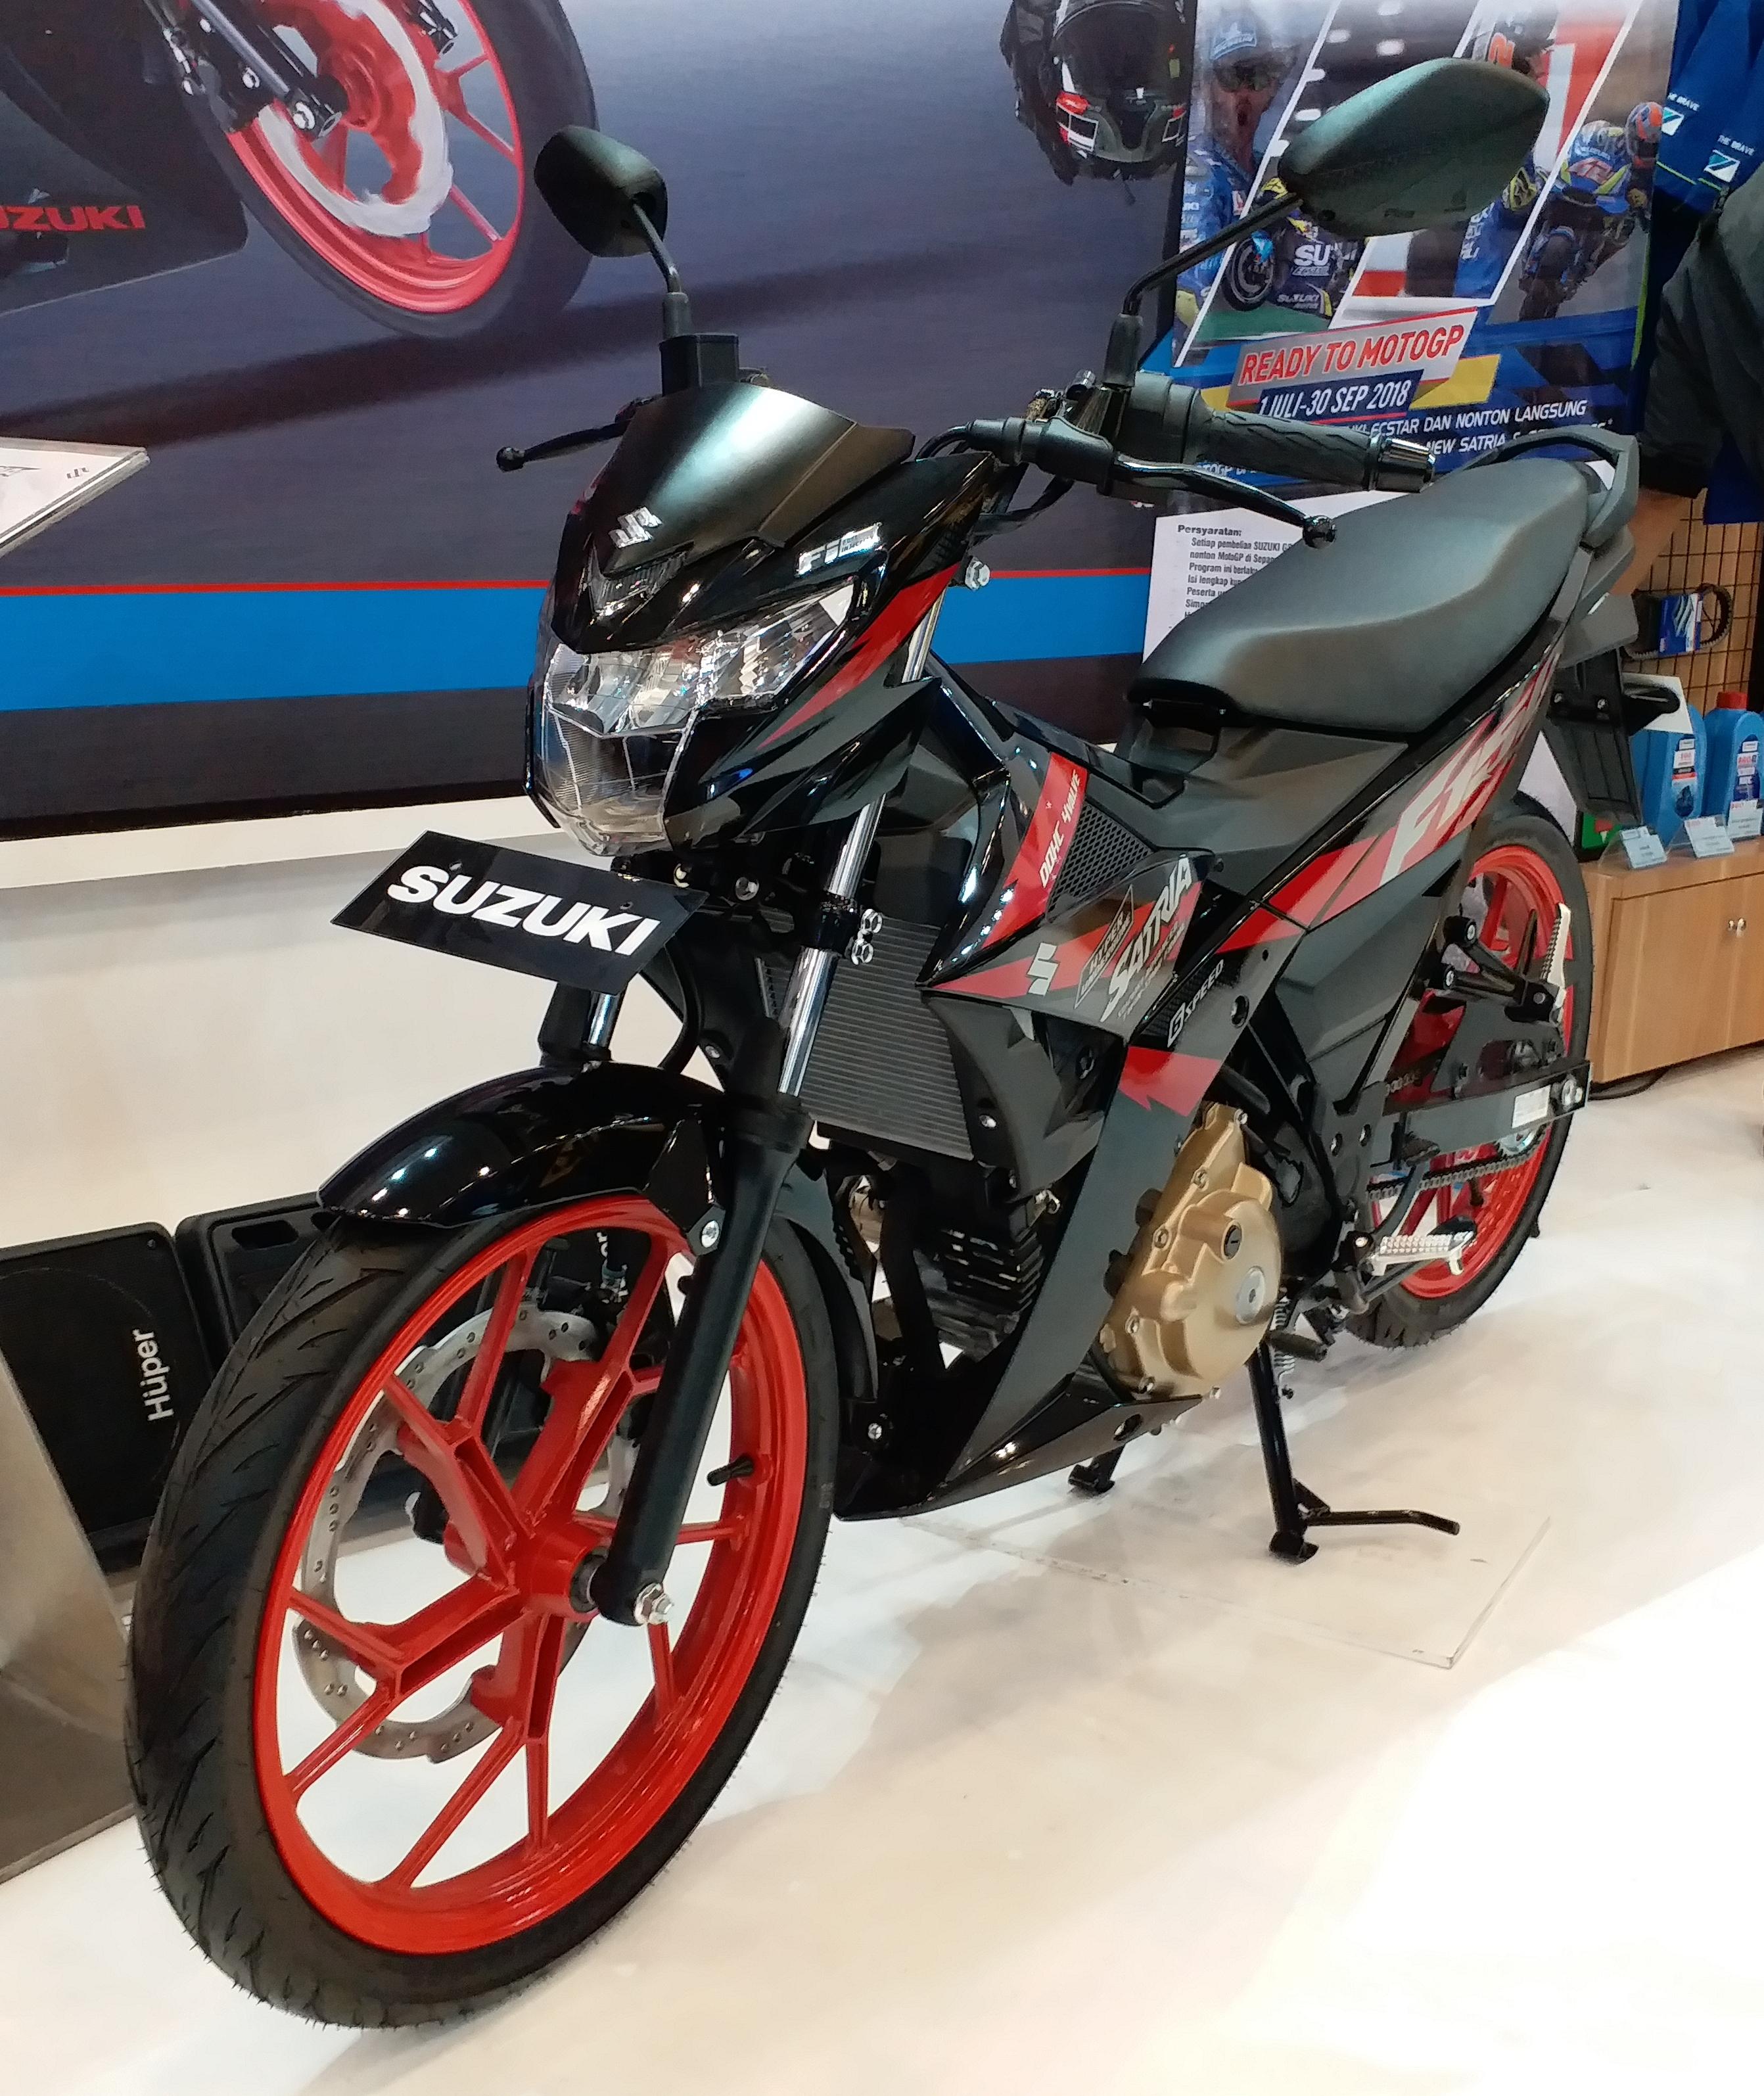 Suzuki raider 150 wikipedia